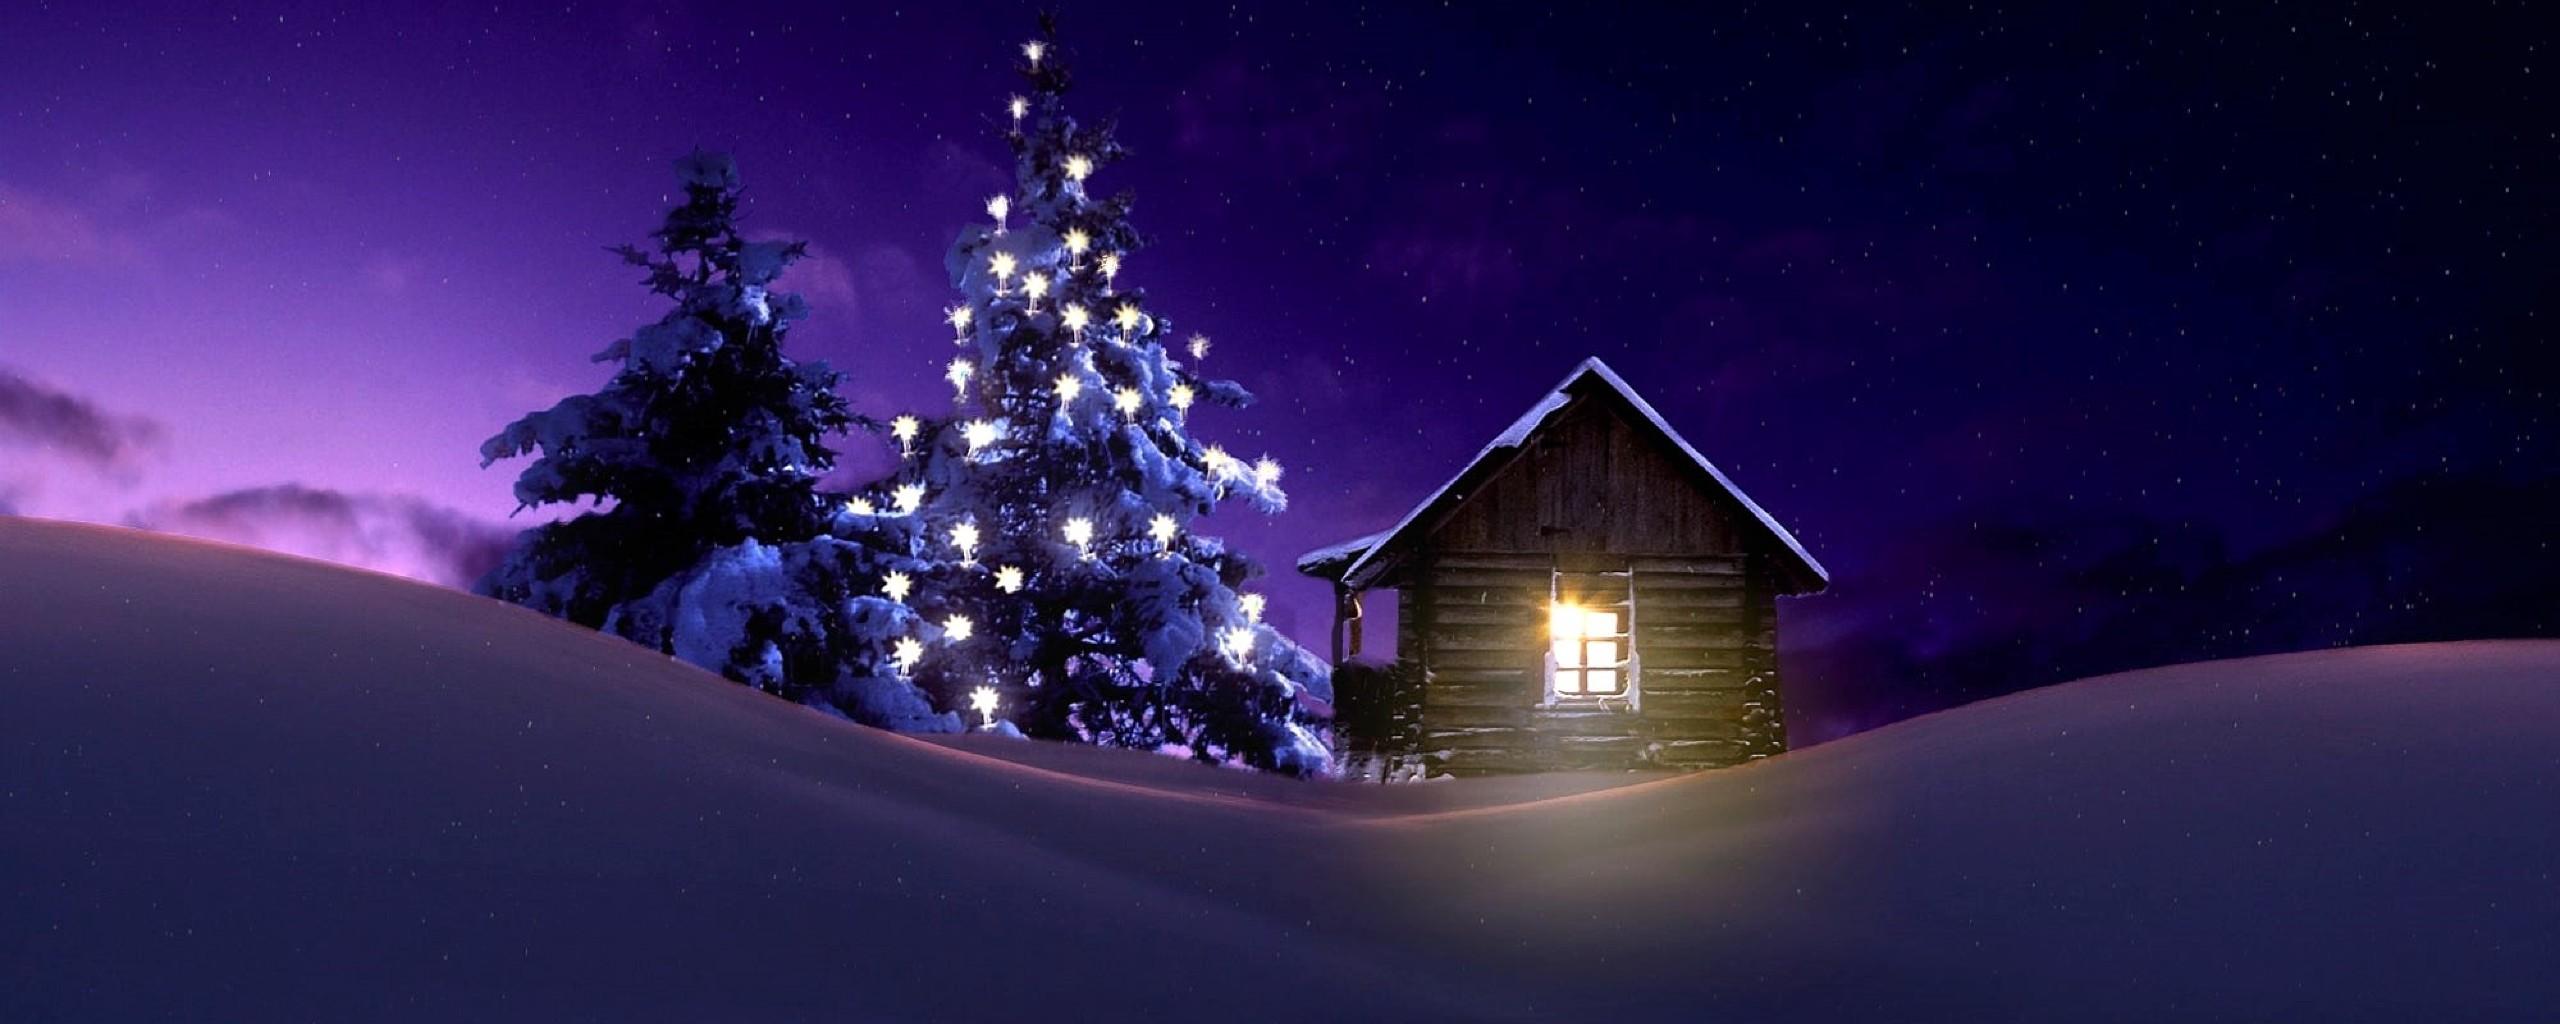 Christmas Wallpaper 1440p